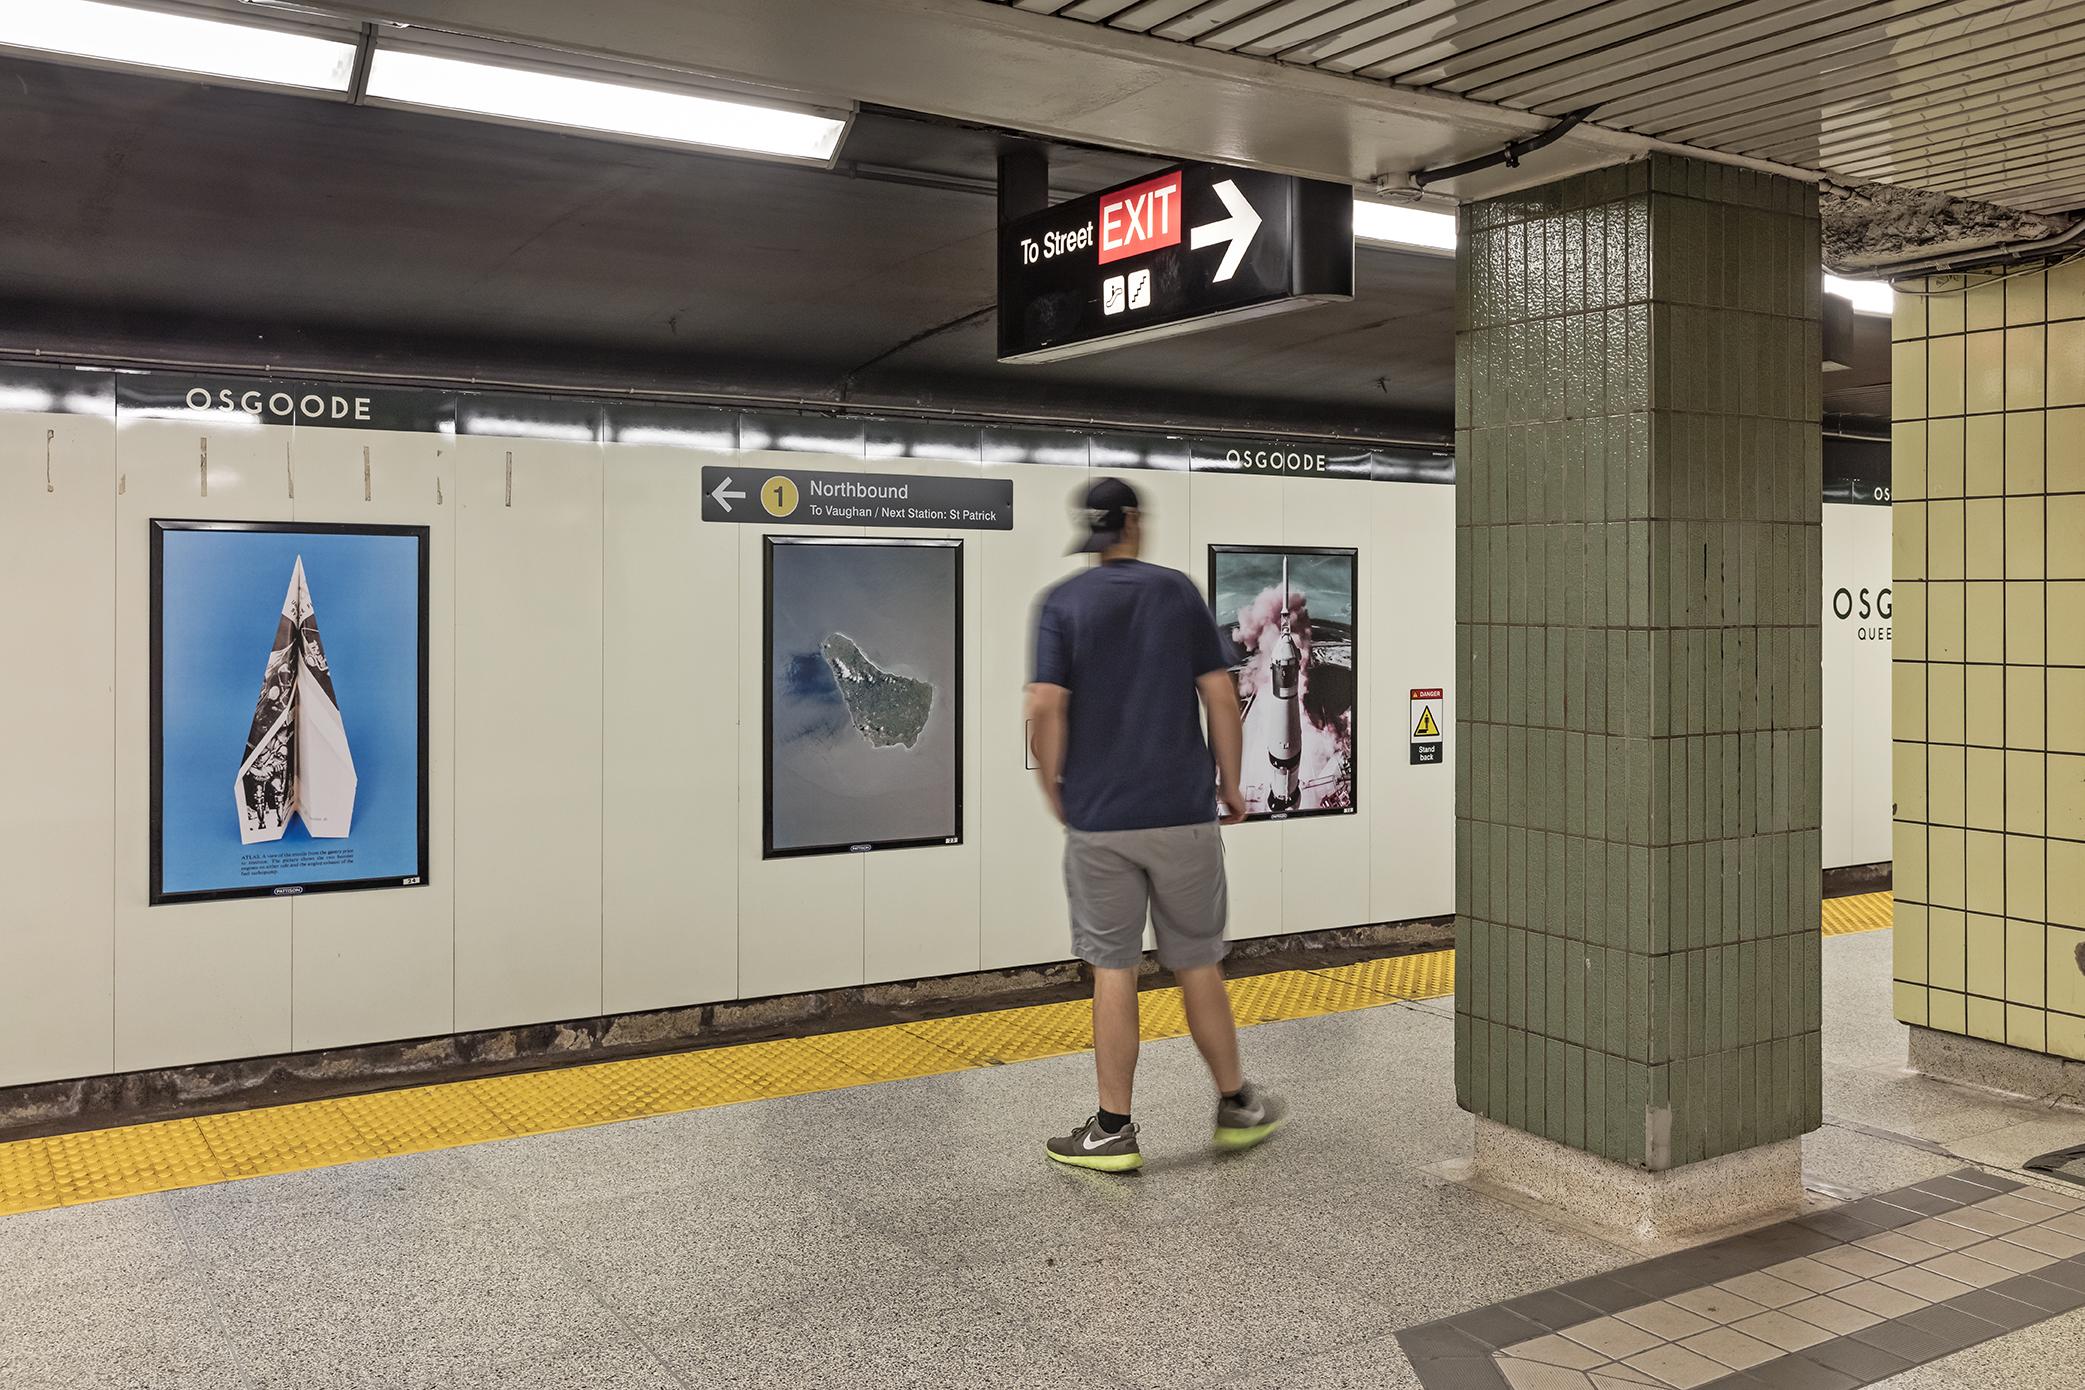 Bianca Salvo, The Universe Makers, Installation at Osgoode subway station, Toronto, 2019. Photo: Toni Hafkenscheid.